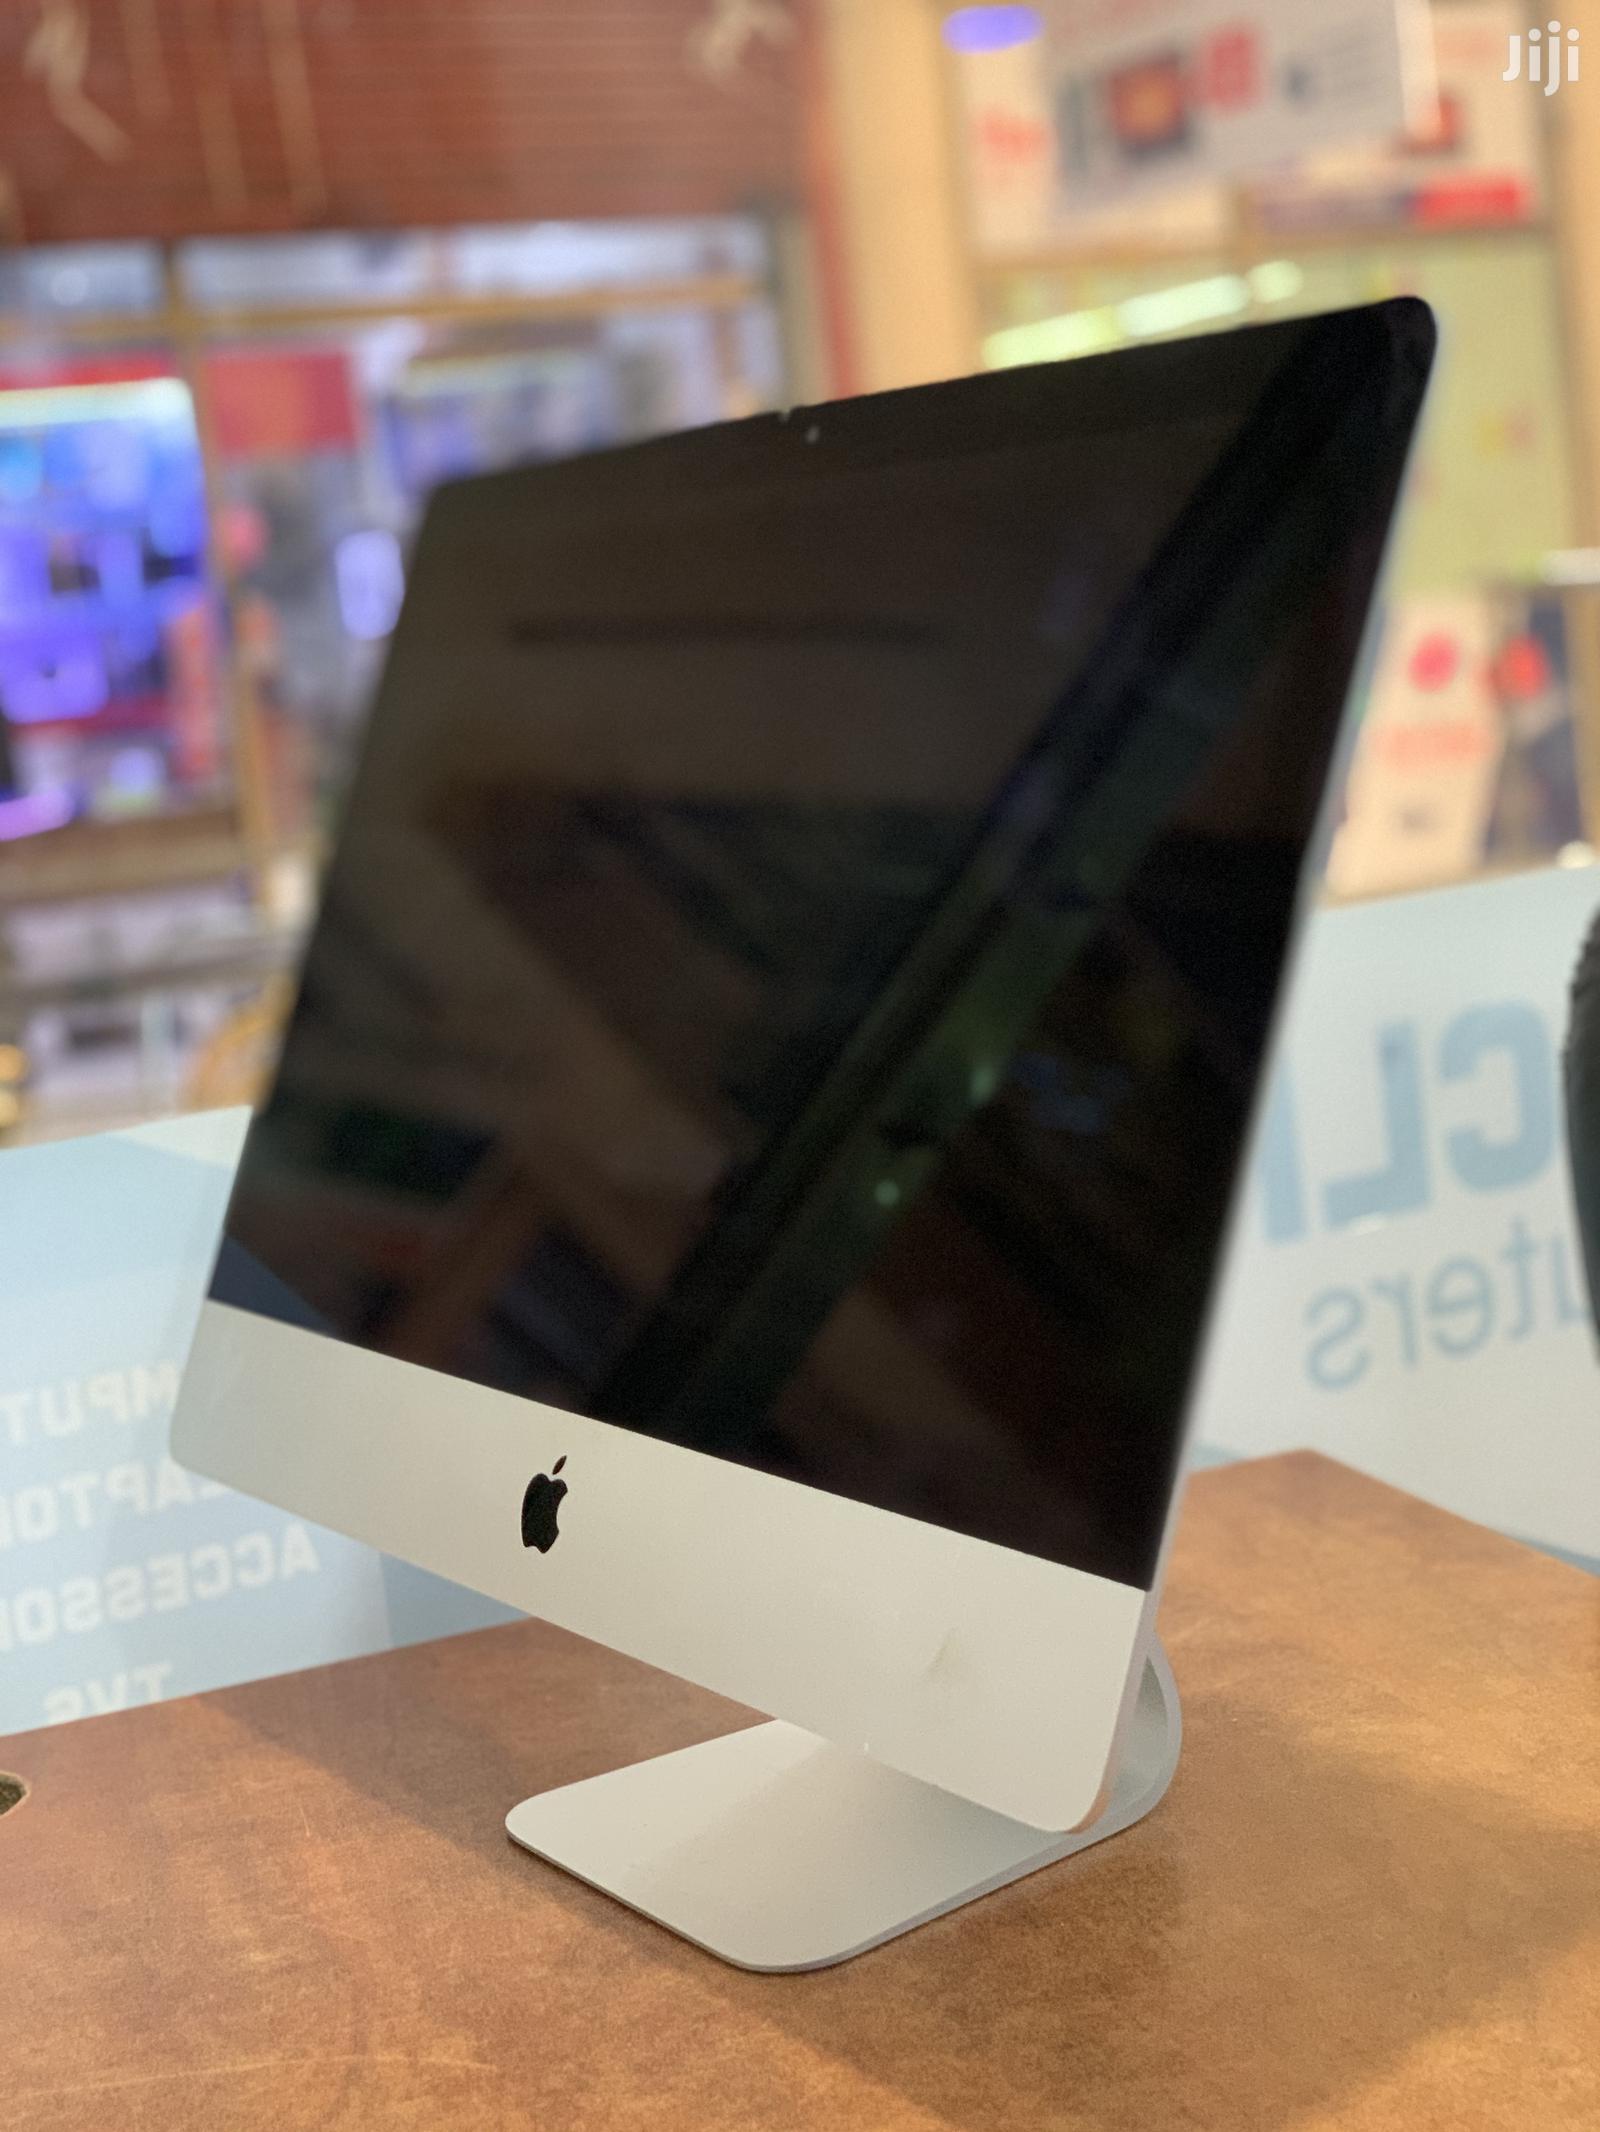 New Desktop Computer Apple iMac 8GB Intel Core i5 SSD 1T | Laptops & Computers for sale in Kampala, Central Region, Uganda